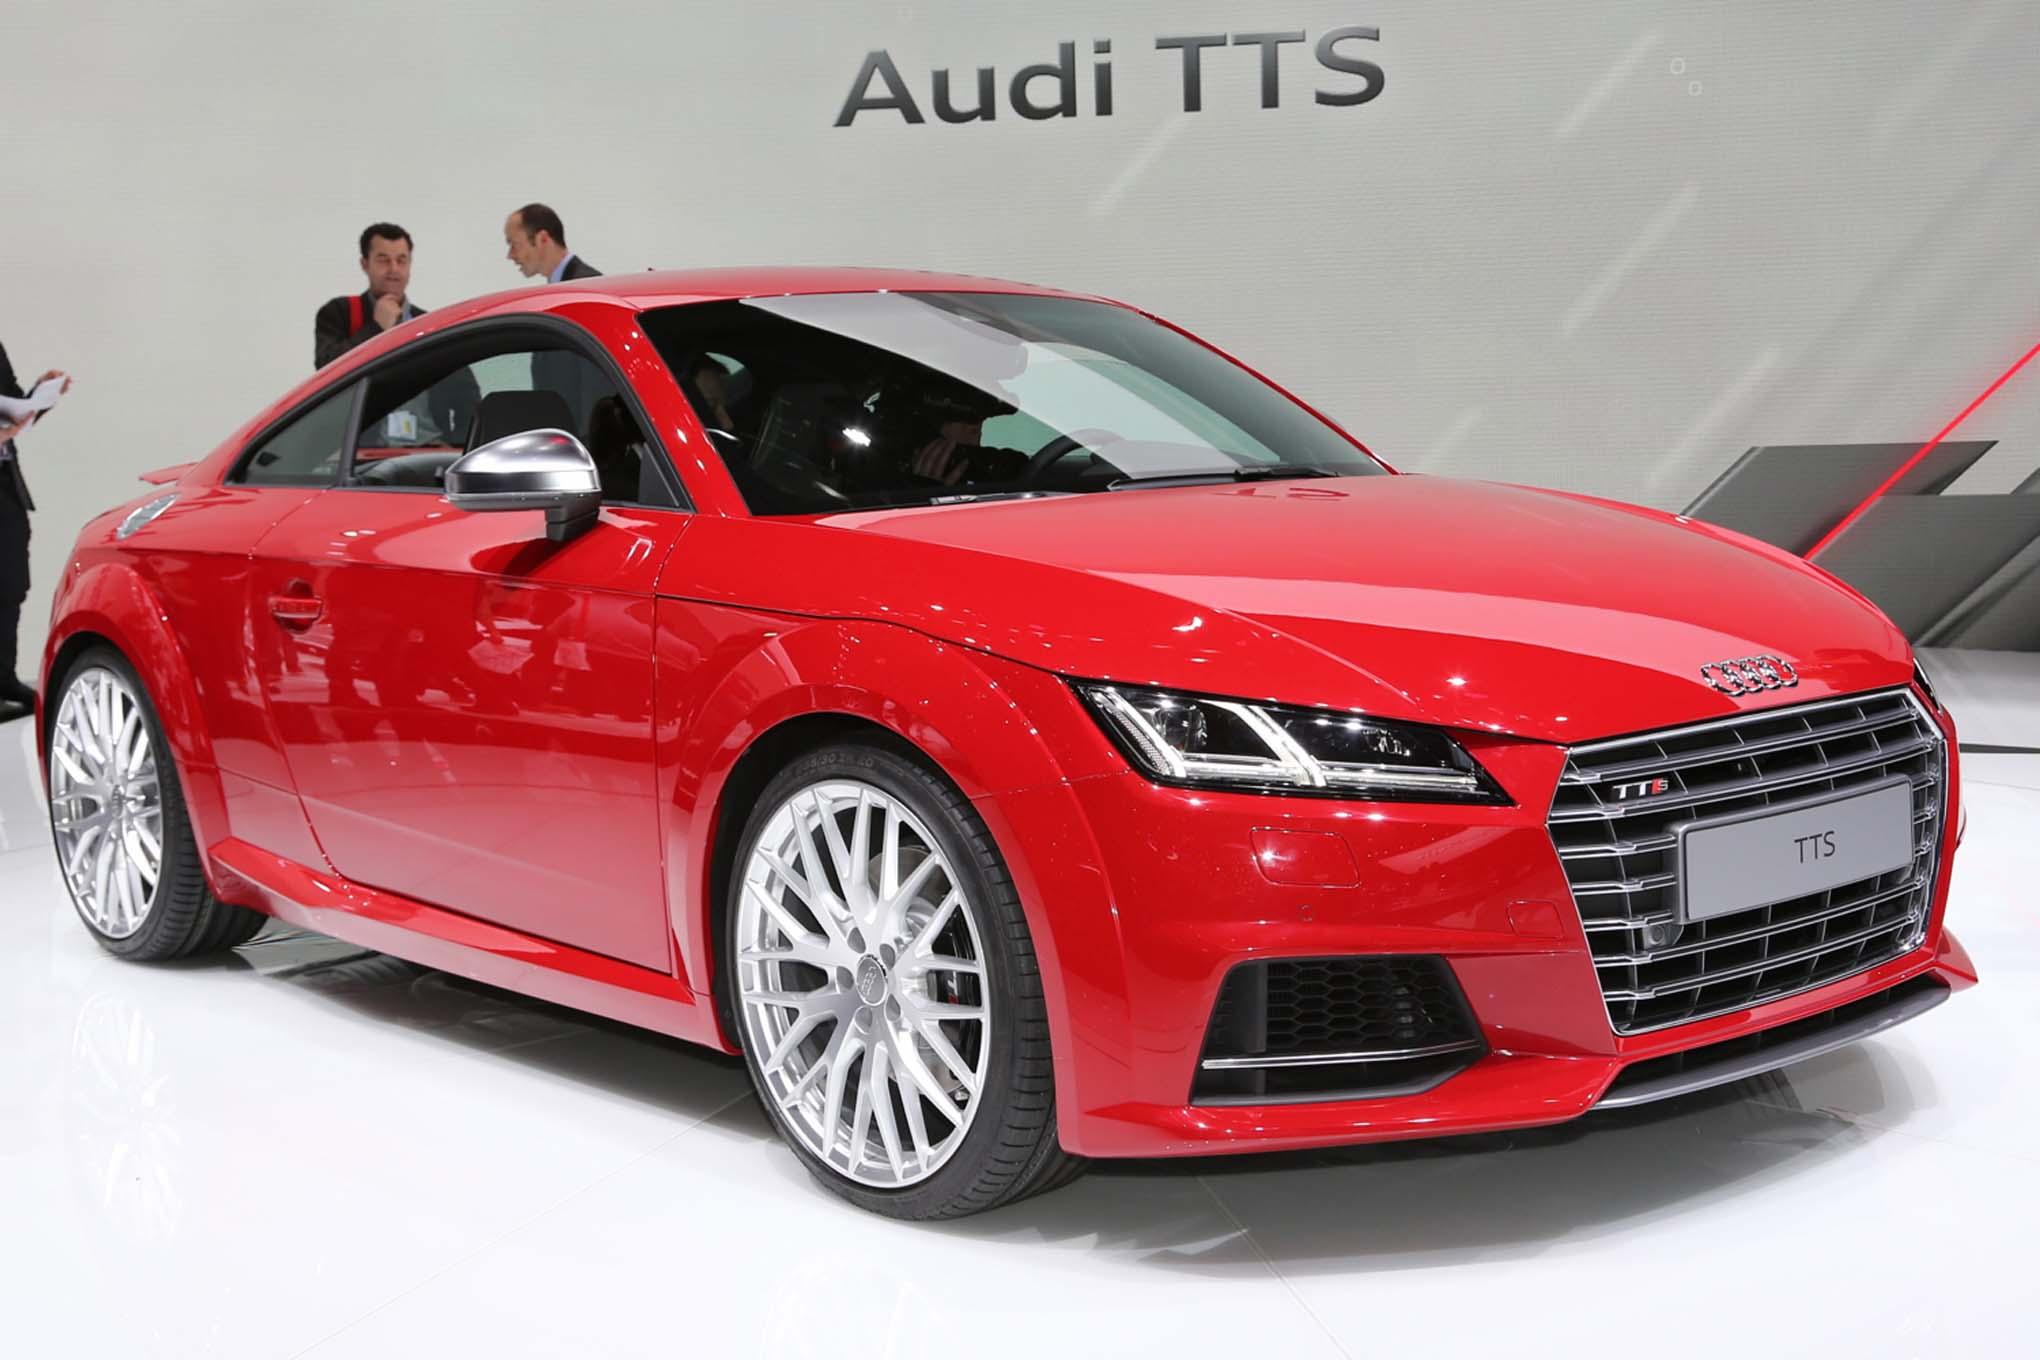 2016 Audi TTS Exterior Profile